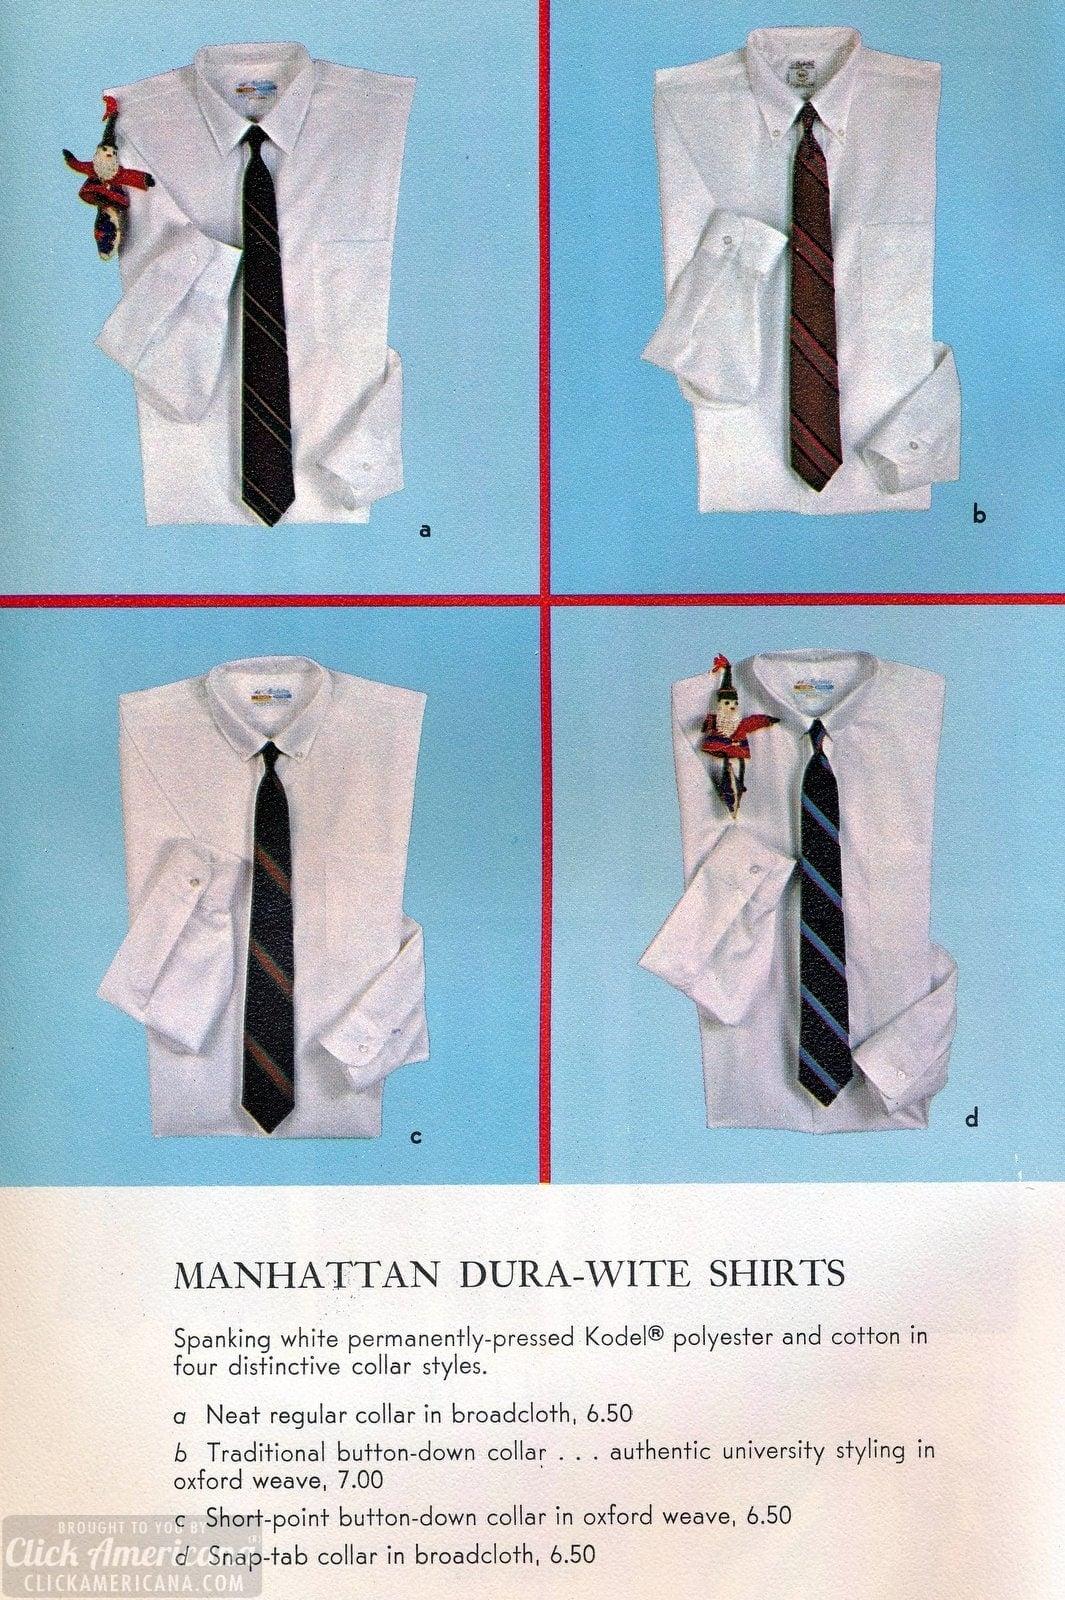 Manhattan Dura-Wite polyester-cotton shirts for men